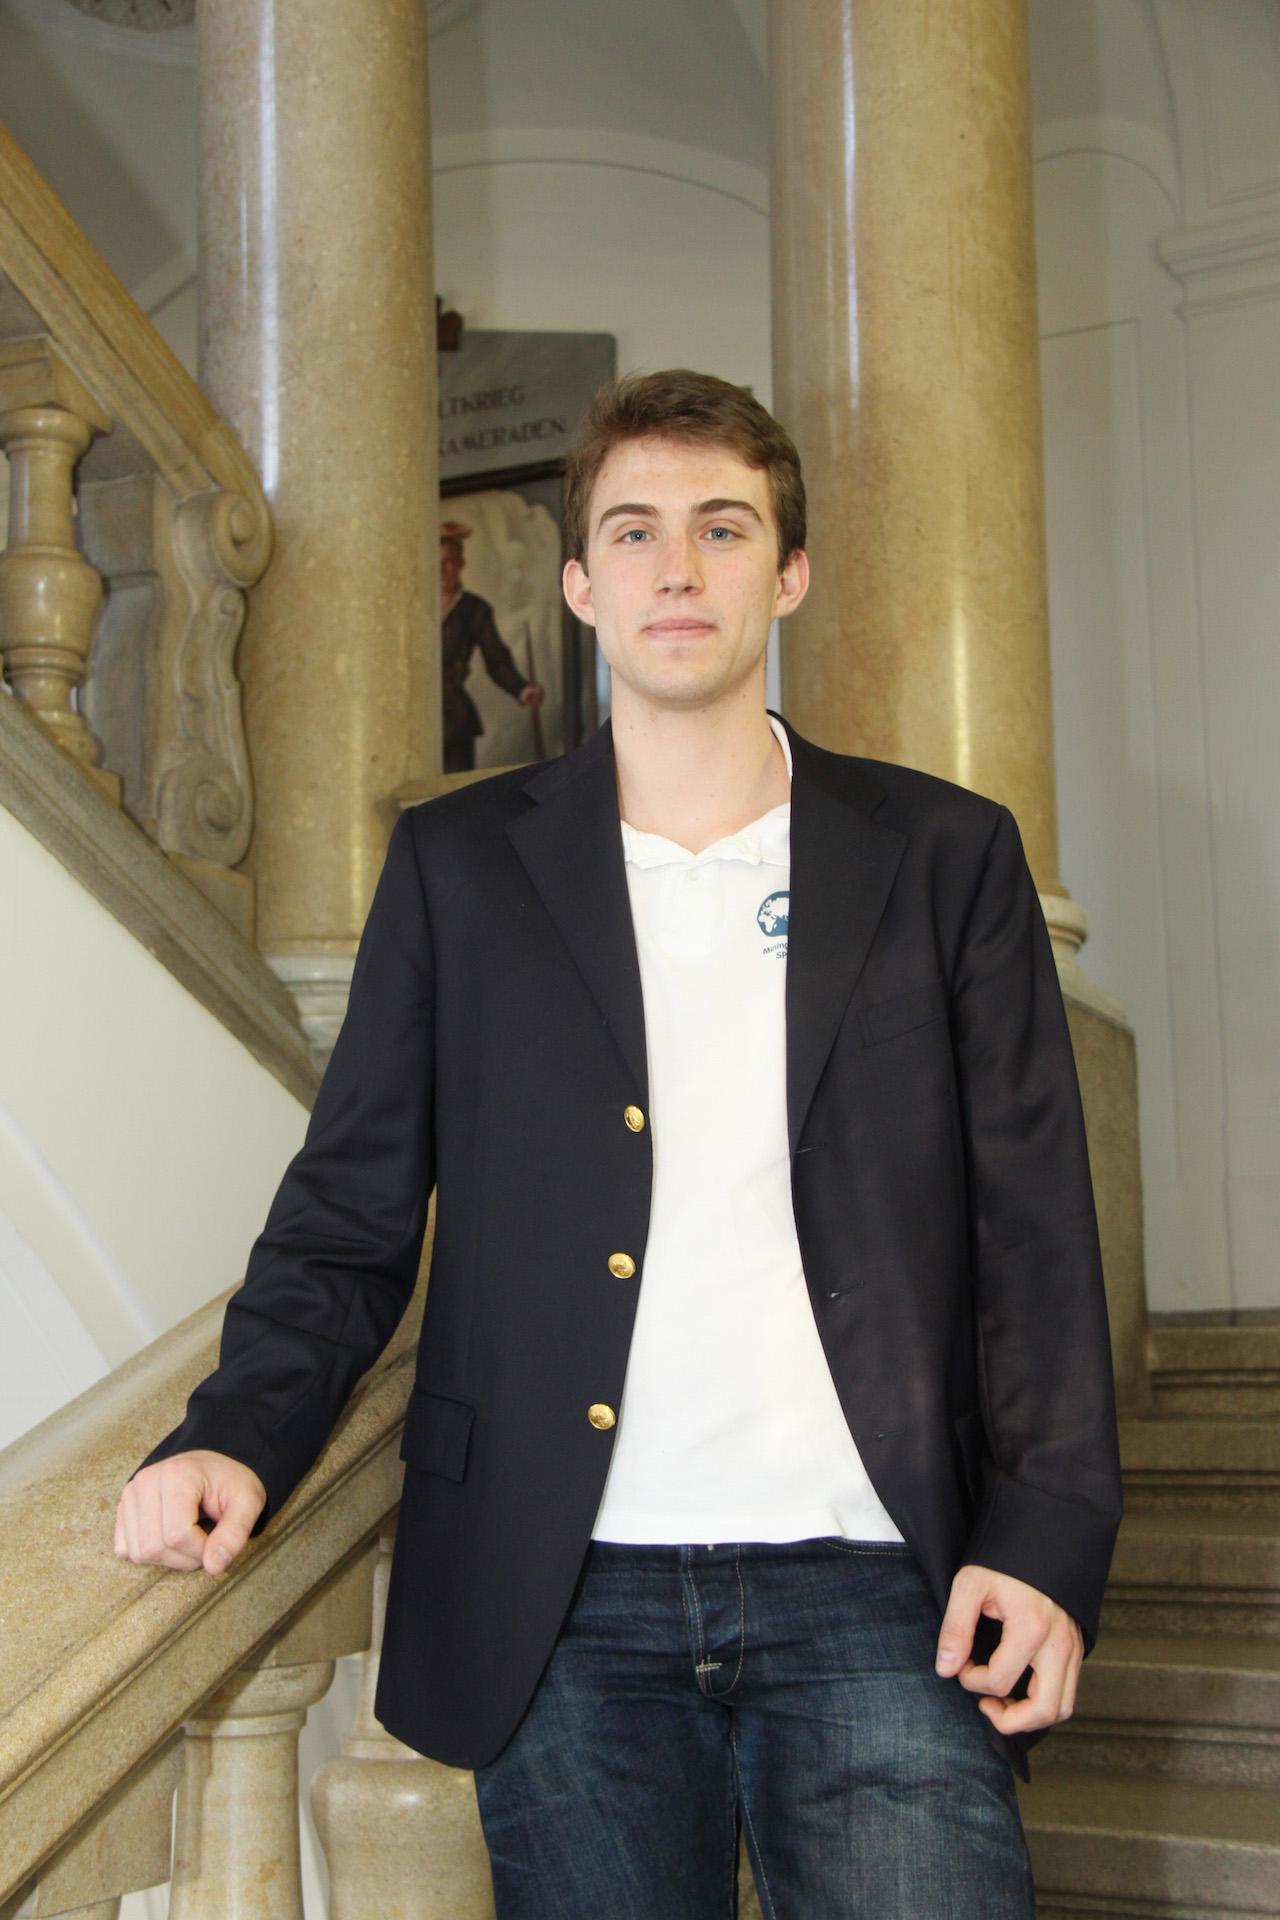 Florian Gamperl - Membership Coordinator